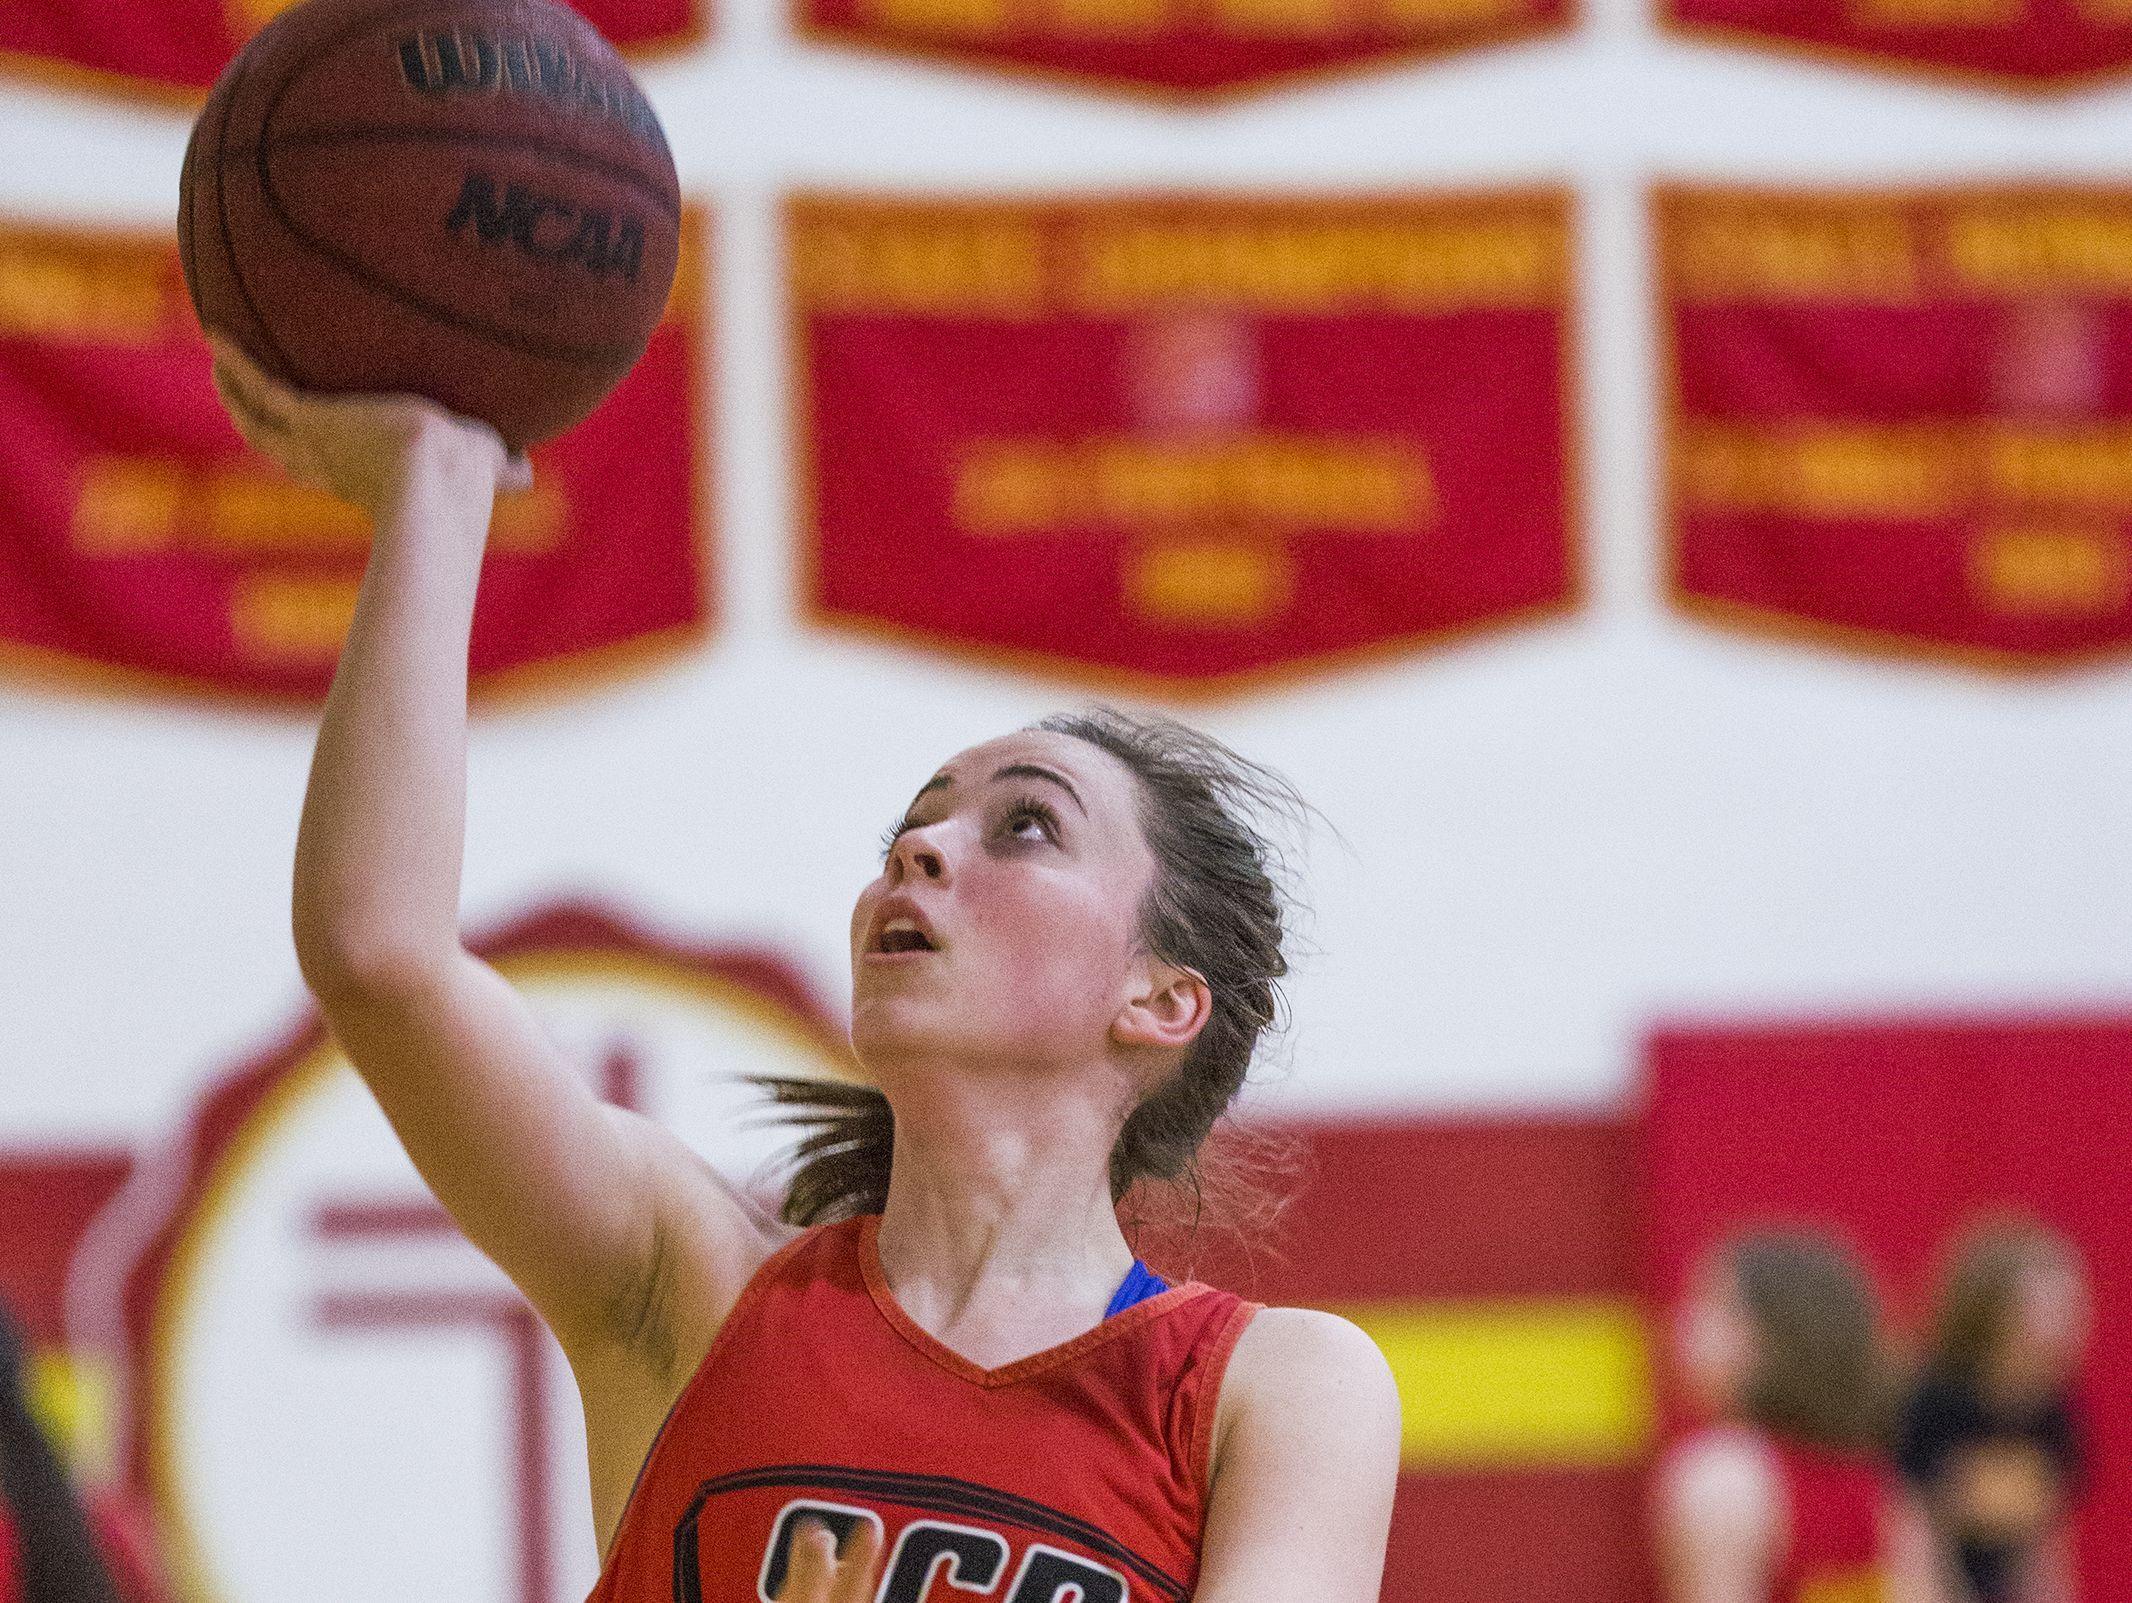 Sarah Barcello is a standout basketball player at Chandler Seton Catholic.